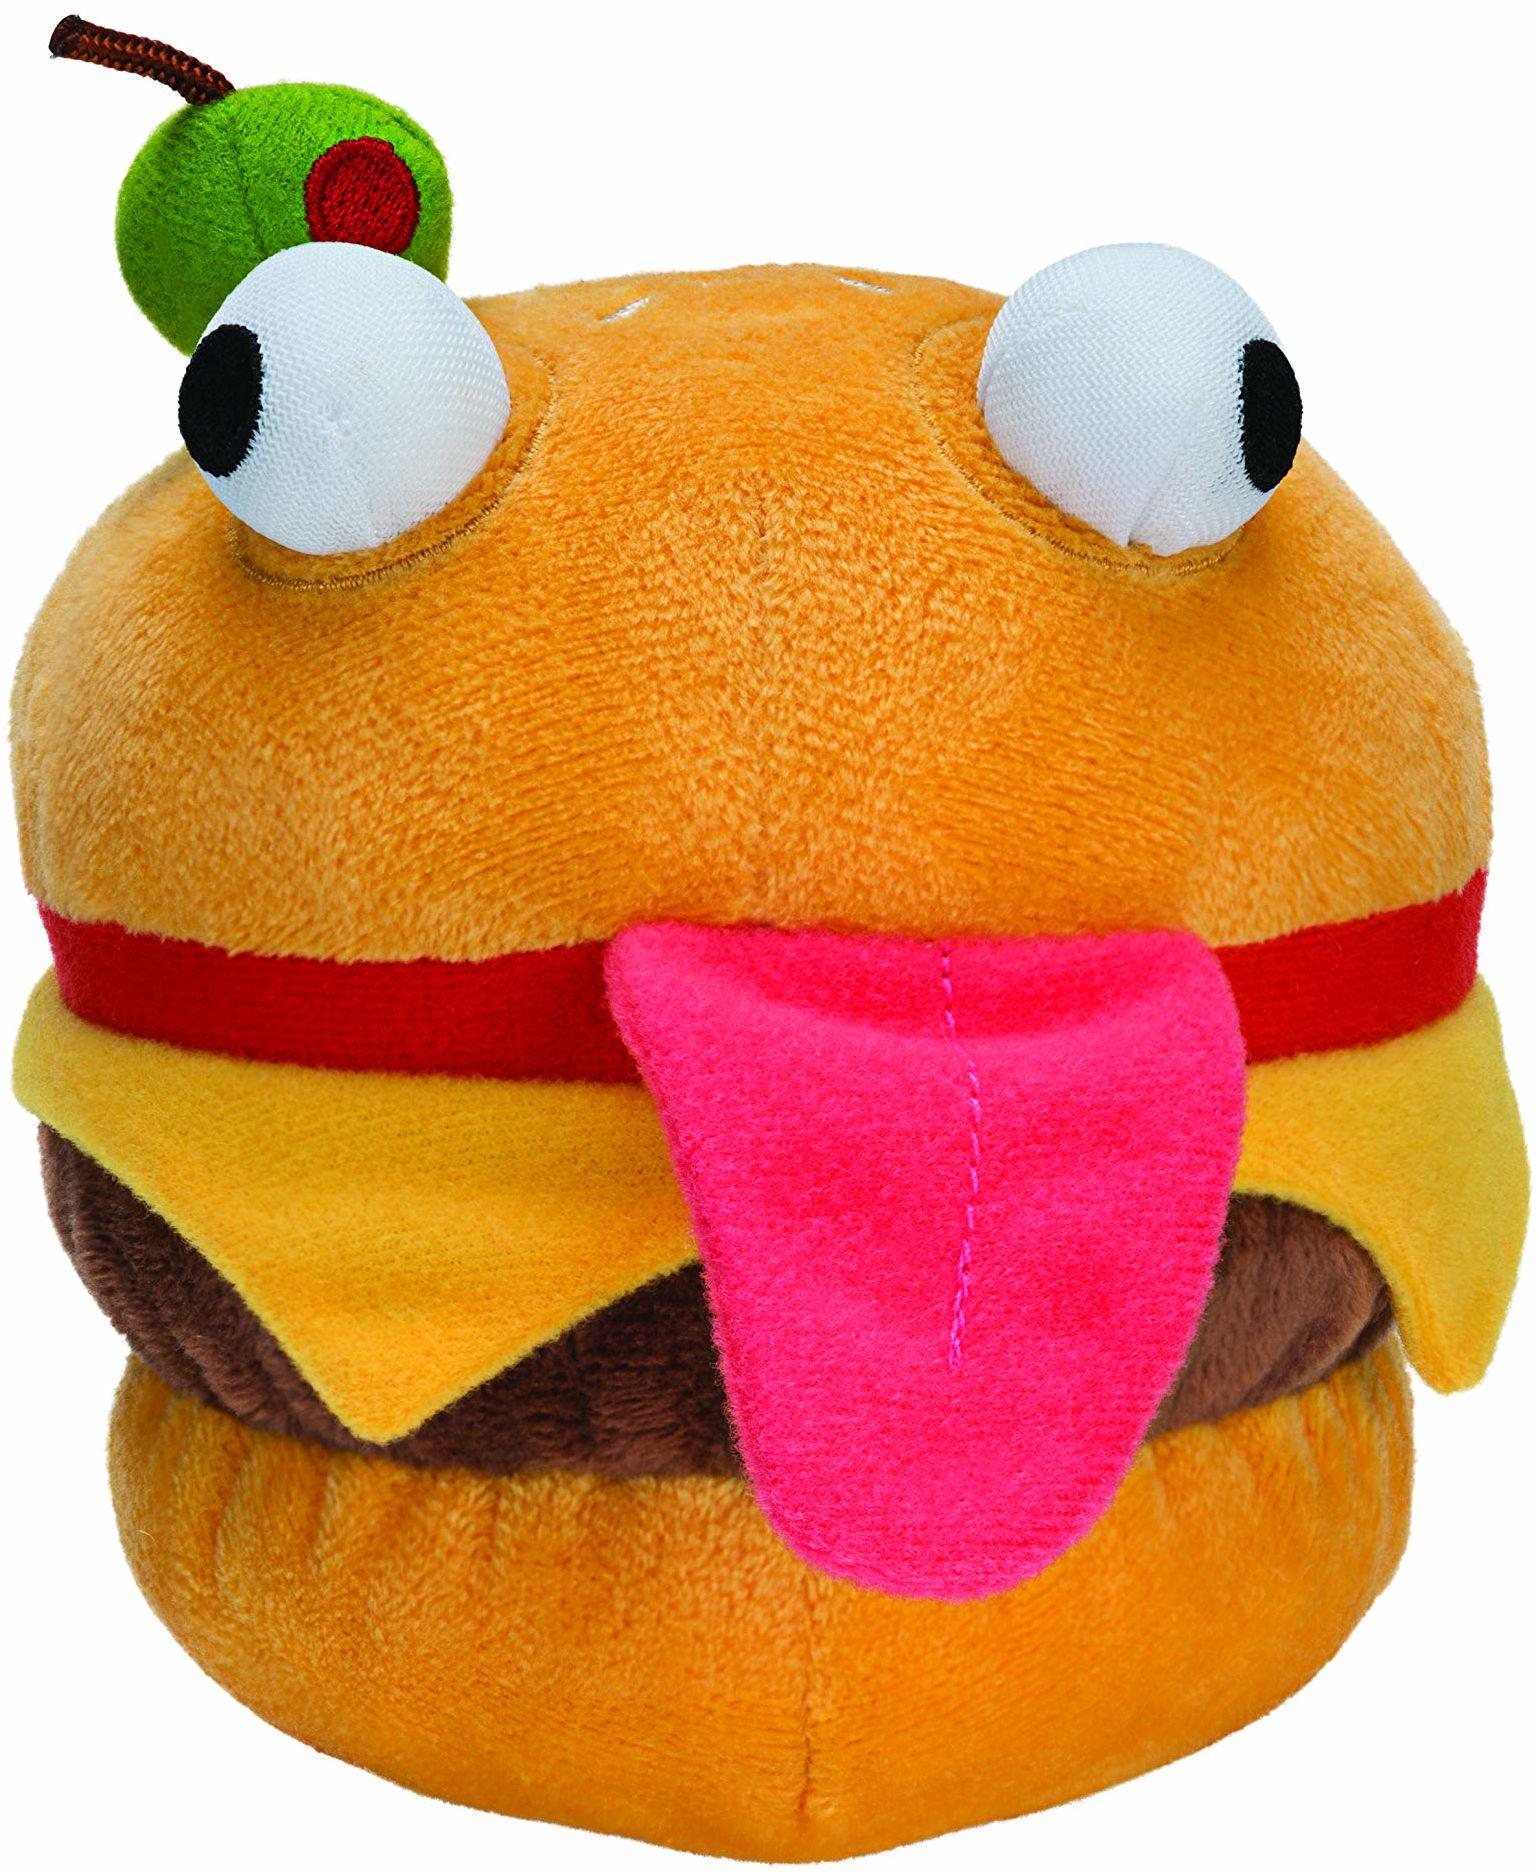 FORTNITE FNT0039 - Durr Burger Loot Plush